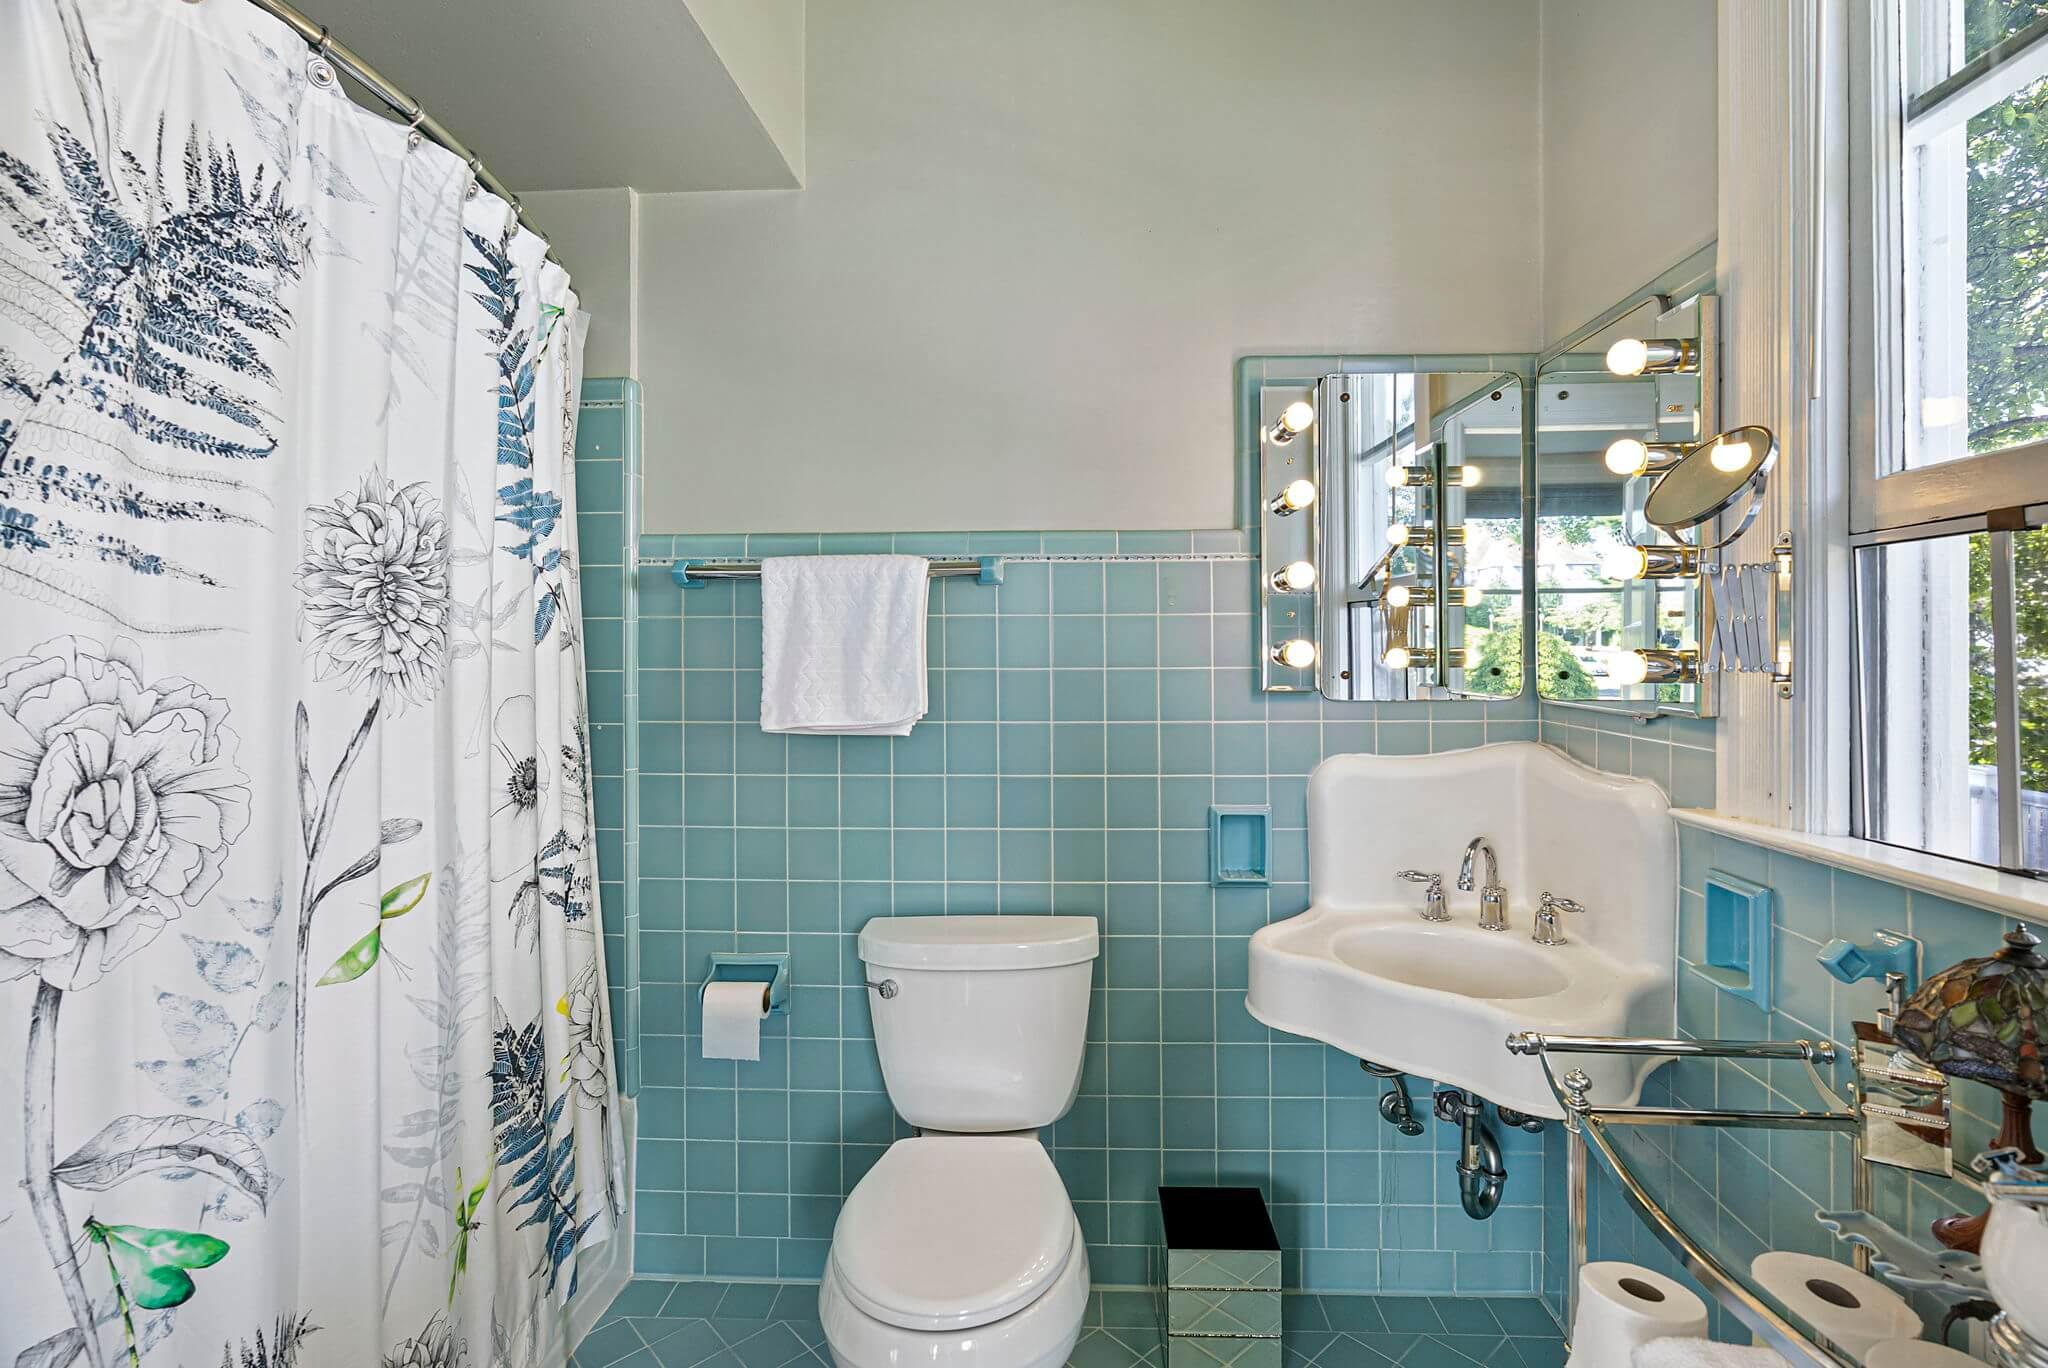 En suite primary bathroom with vintage tile and corner sink